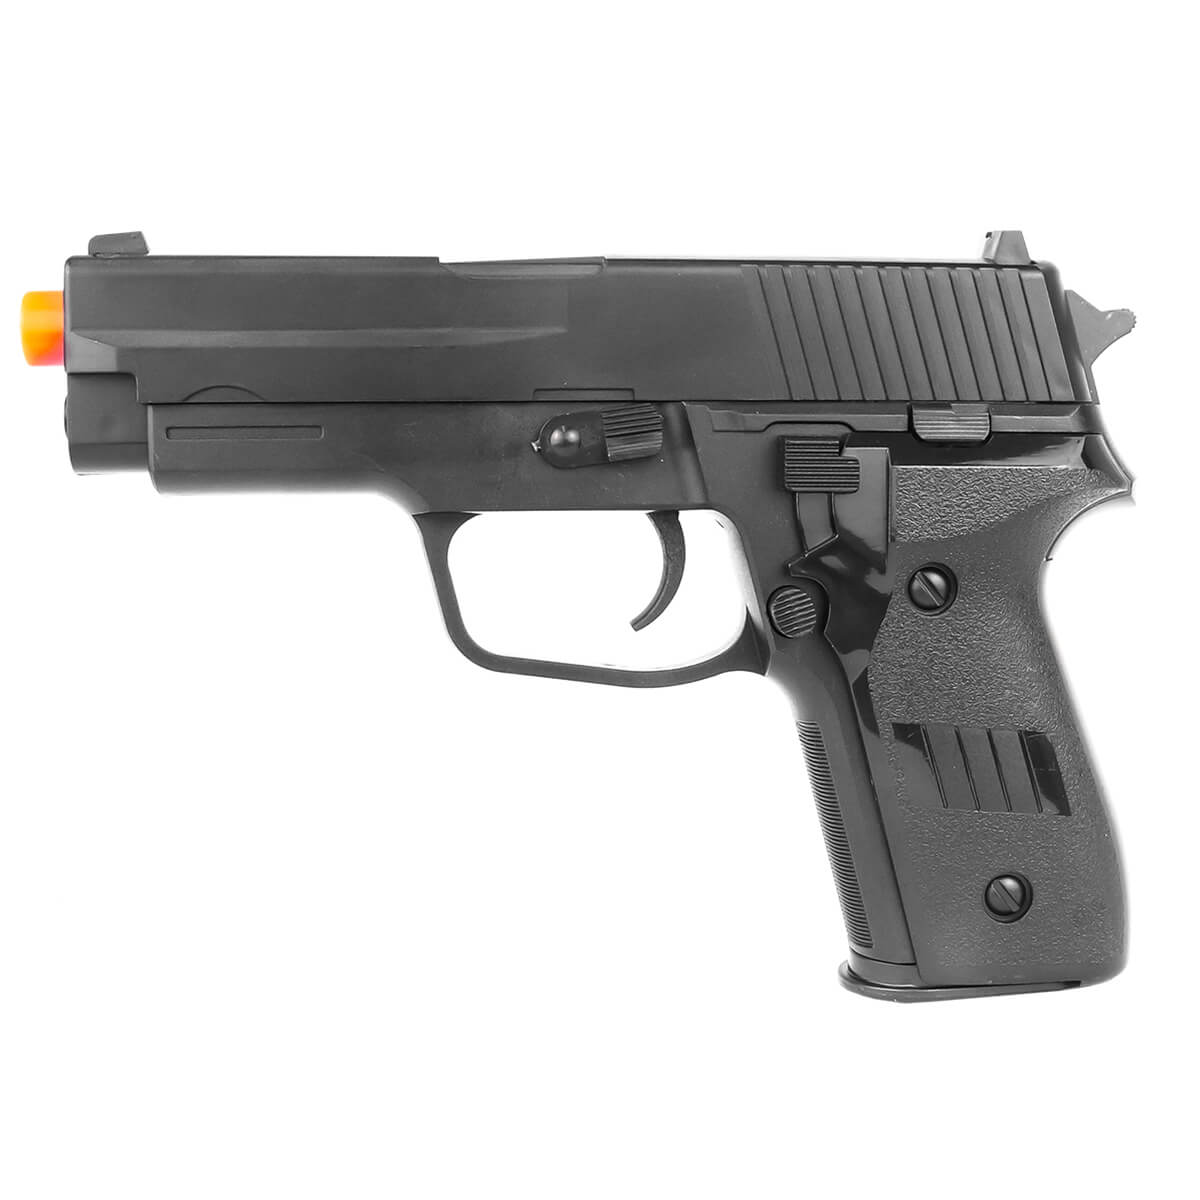 Pistola Airsoft VG P226 6mm